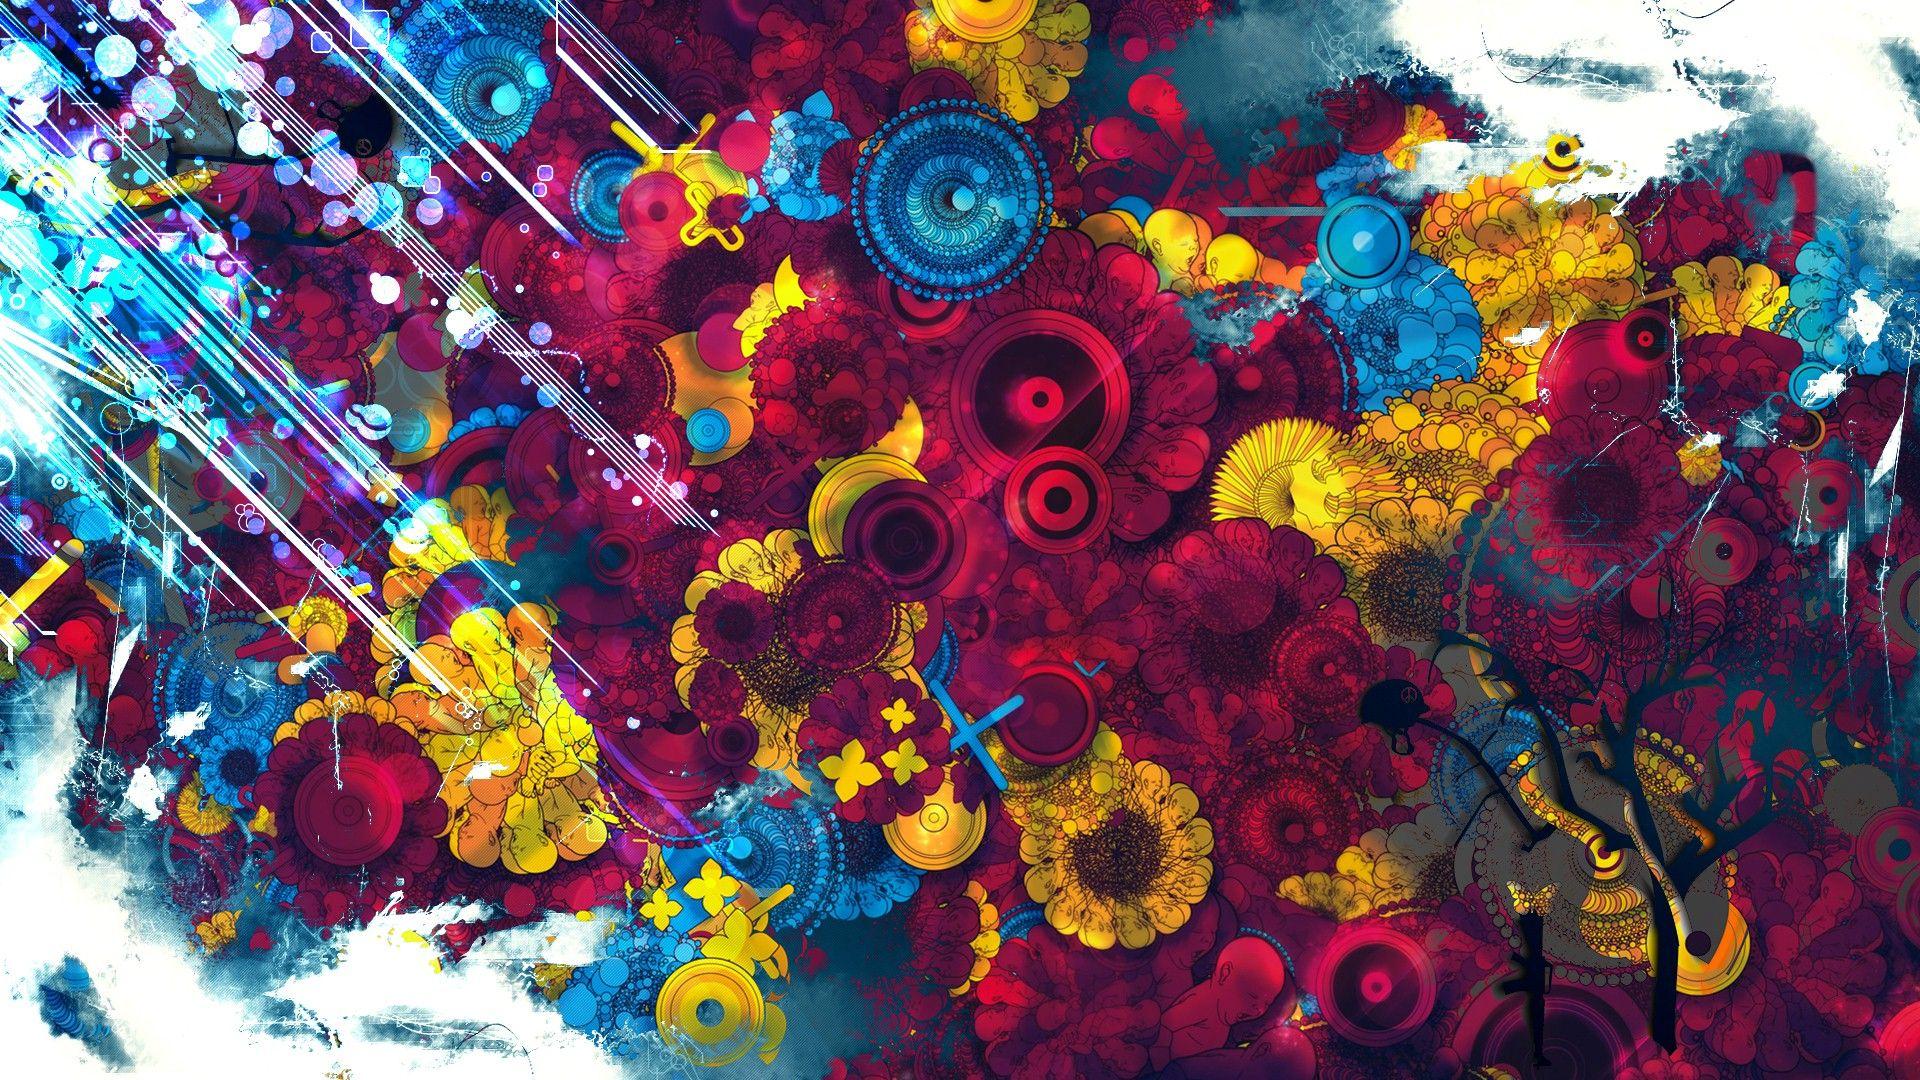 Beautiful HD Vector Wallpapers for Desktop HD Wallpapers